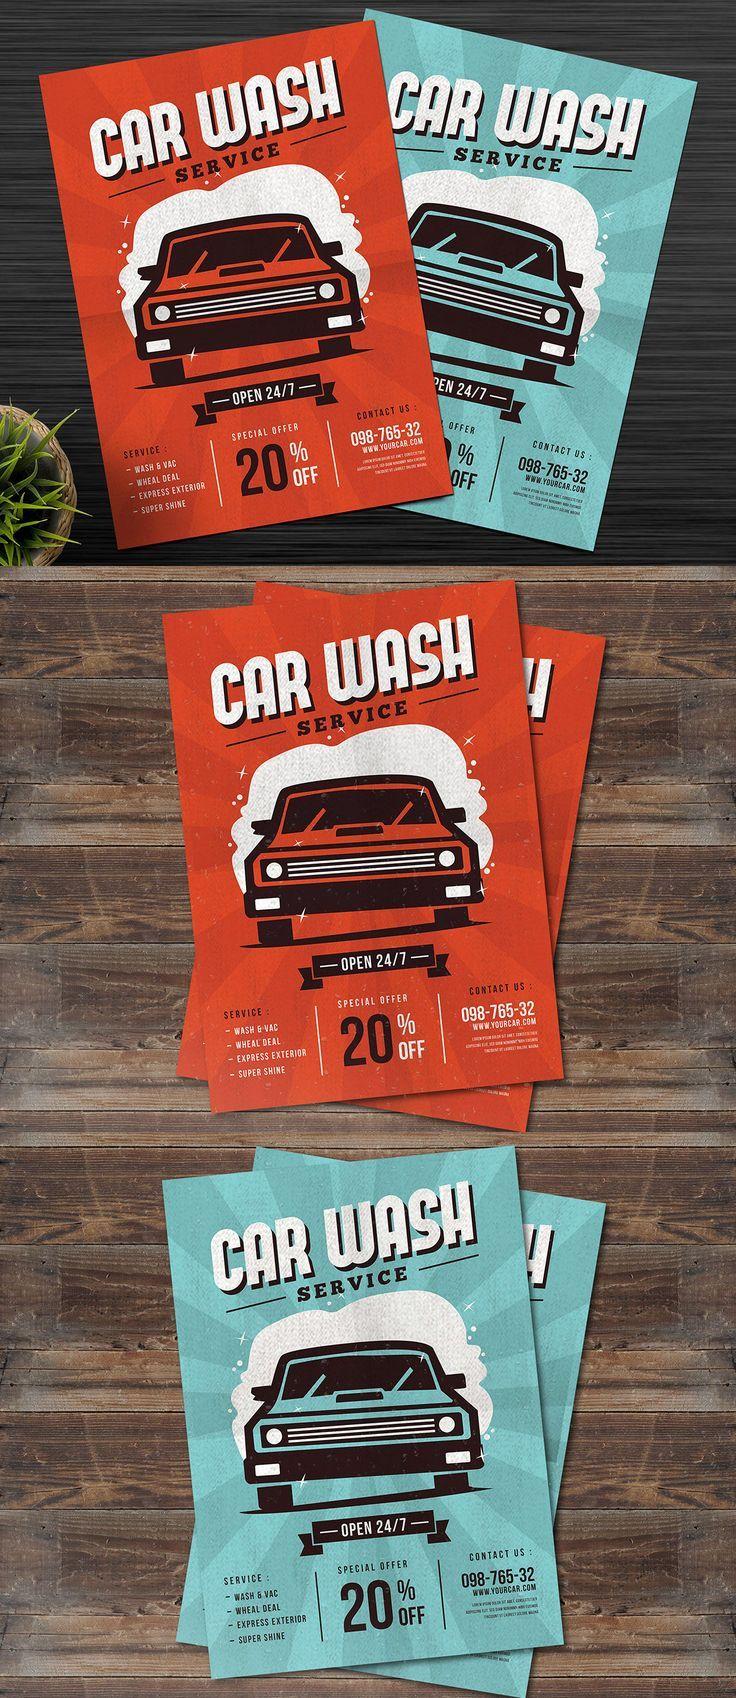 car wash service flyer template ai psd cars pinterest car